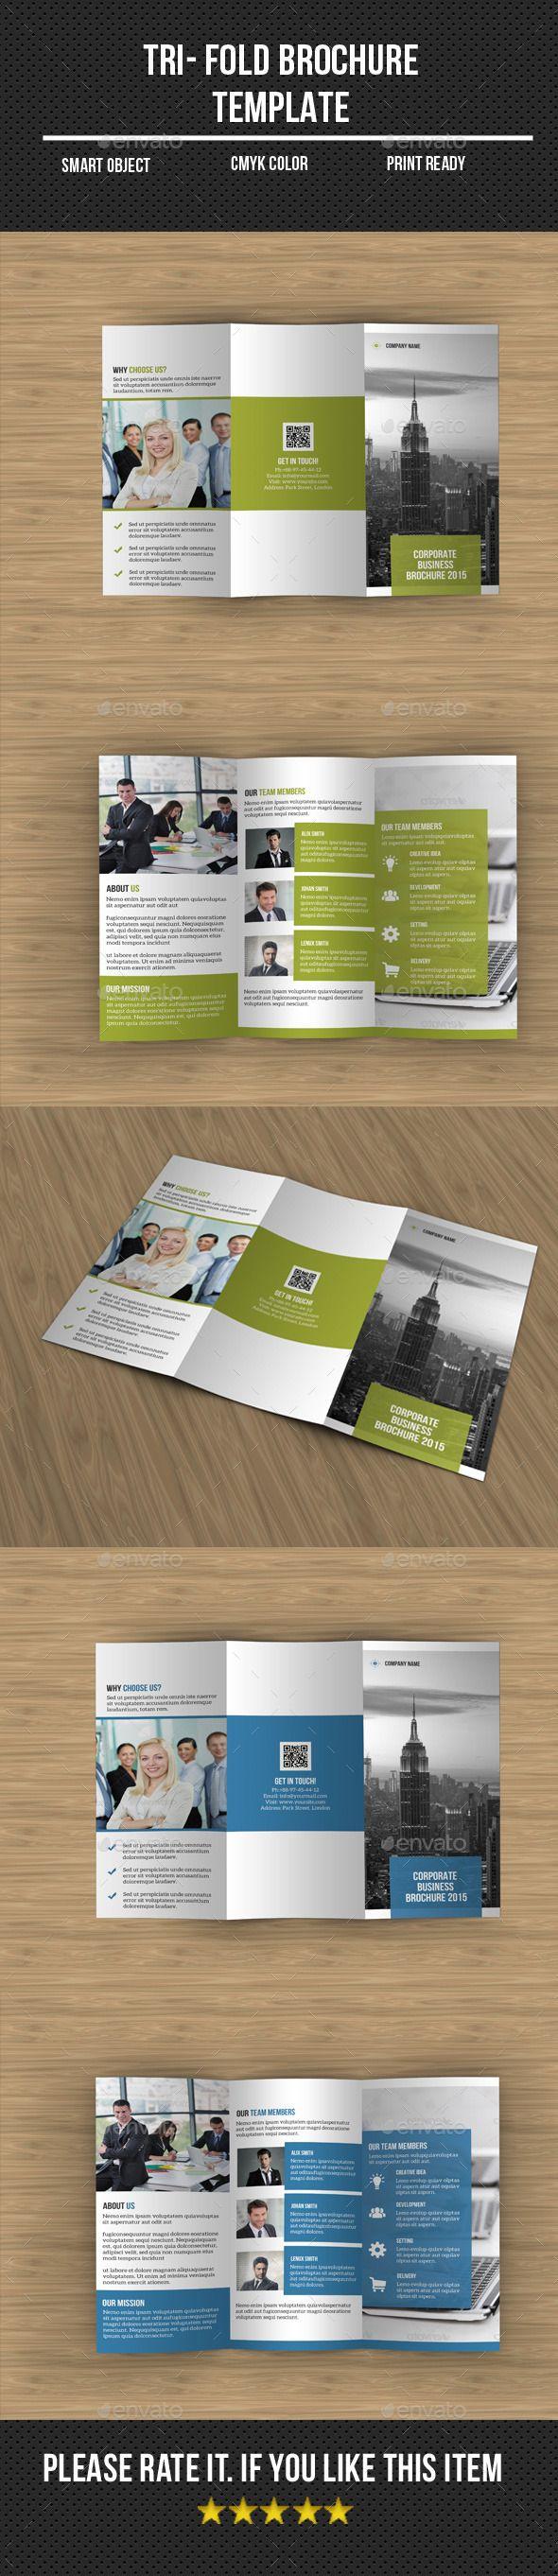 pin by bashooka web graphic design on real estate. Black Bedroom Furniture Sets. Home Design Ideas